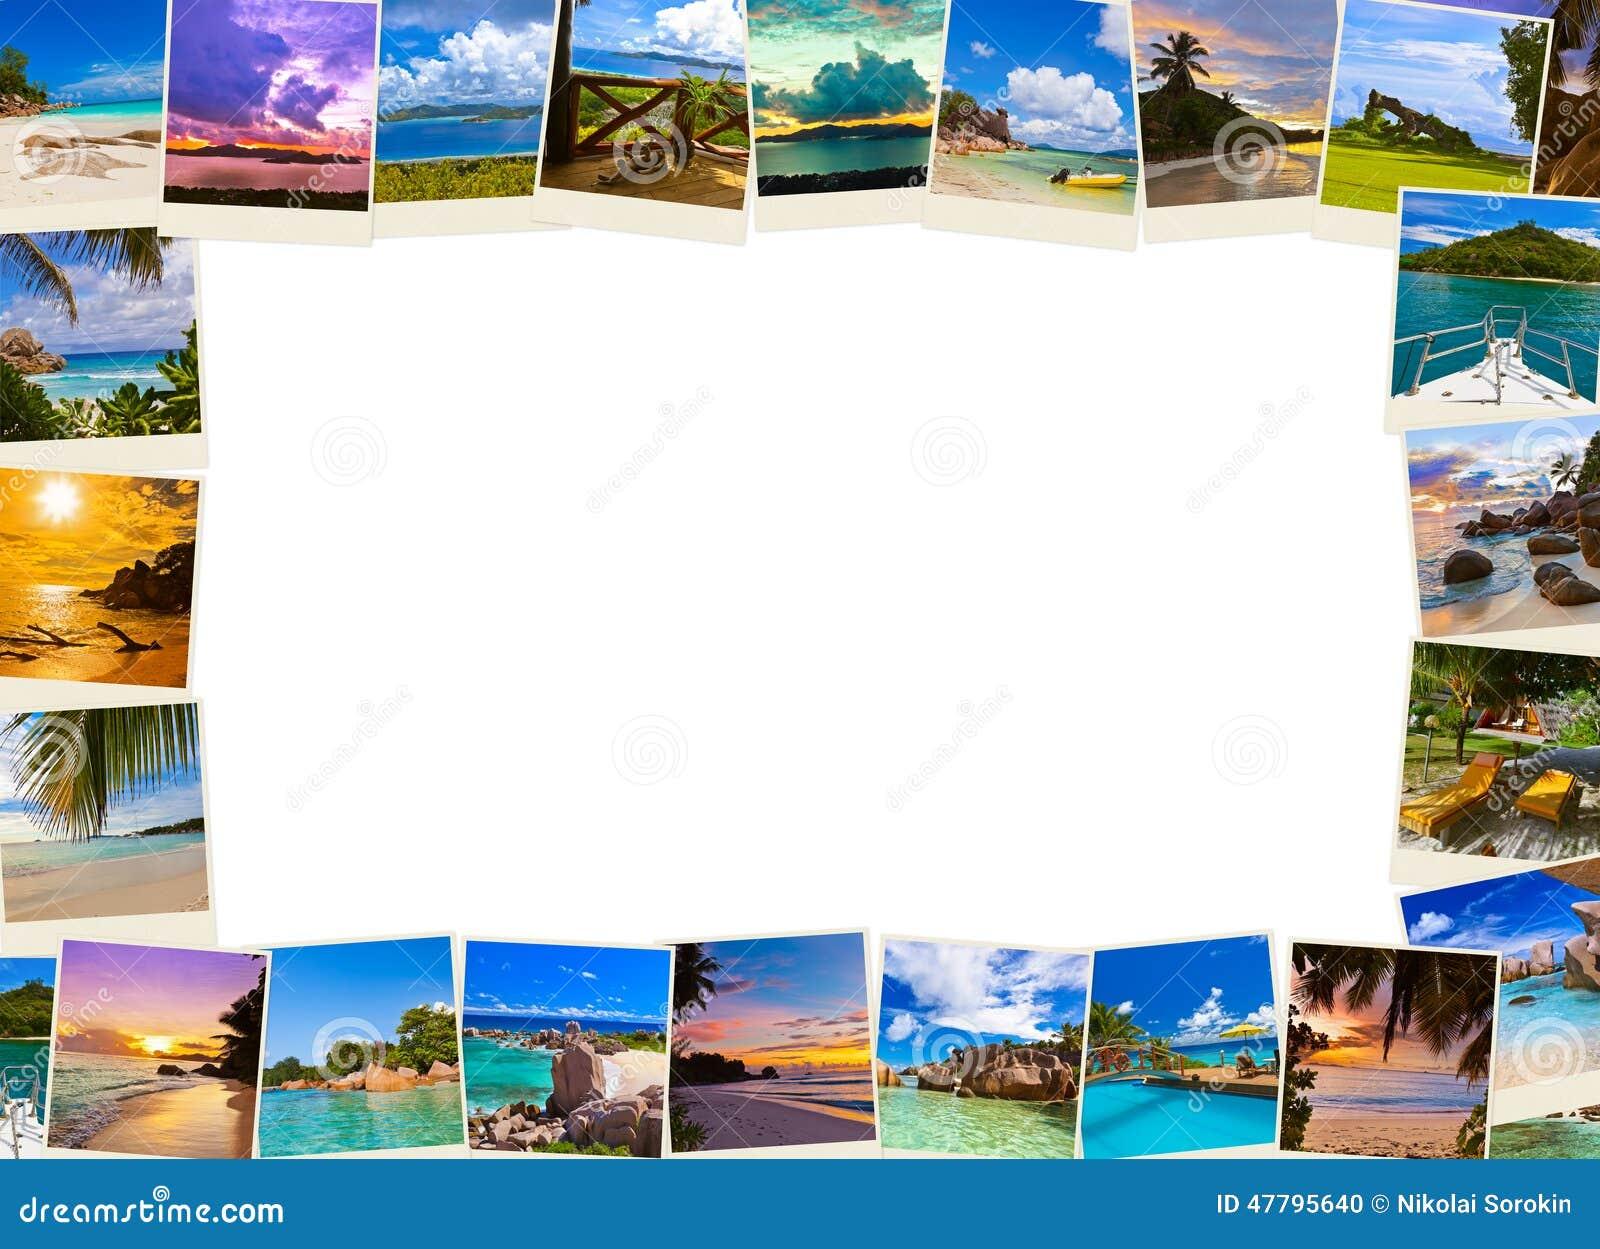 frame made of summer beach maldives images stock photo image of coastline background 47795640. Black Bedroom Furniture Sets. Home Design Ideas